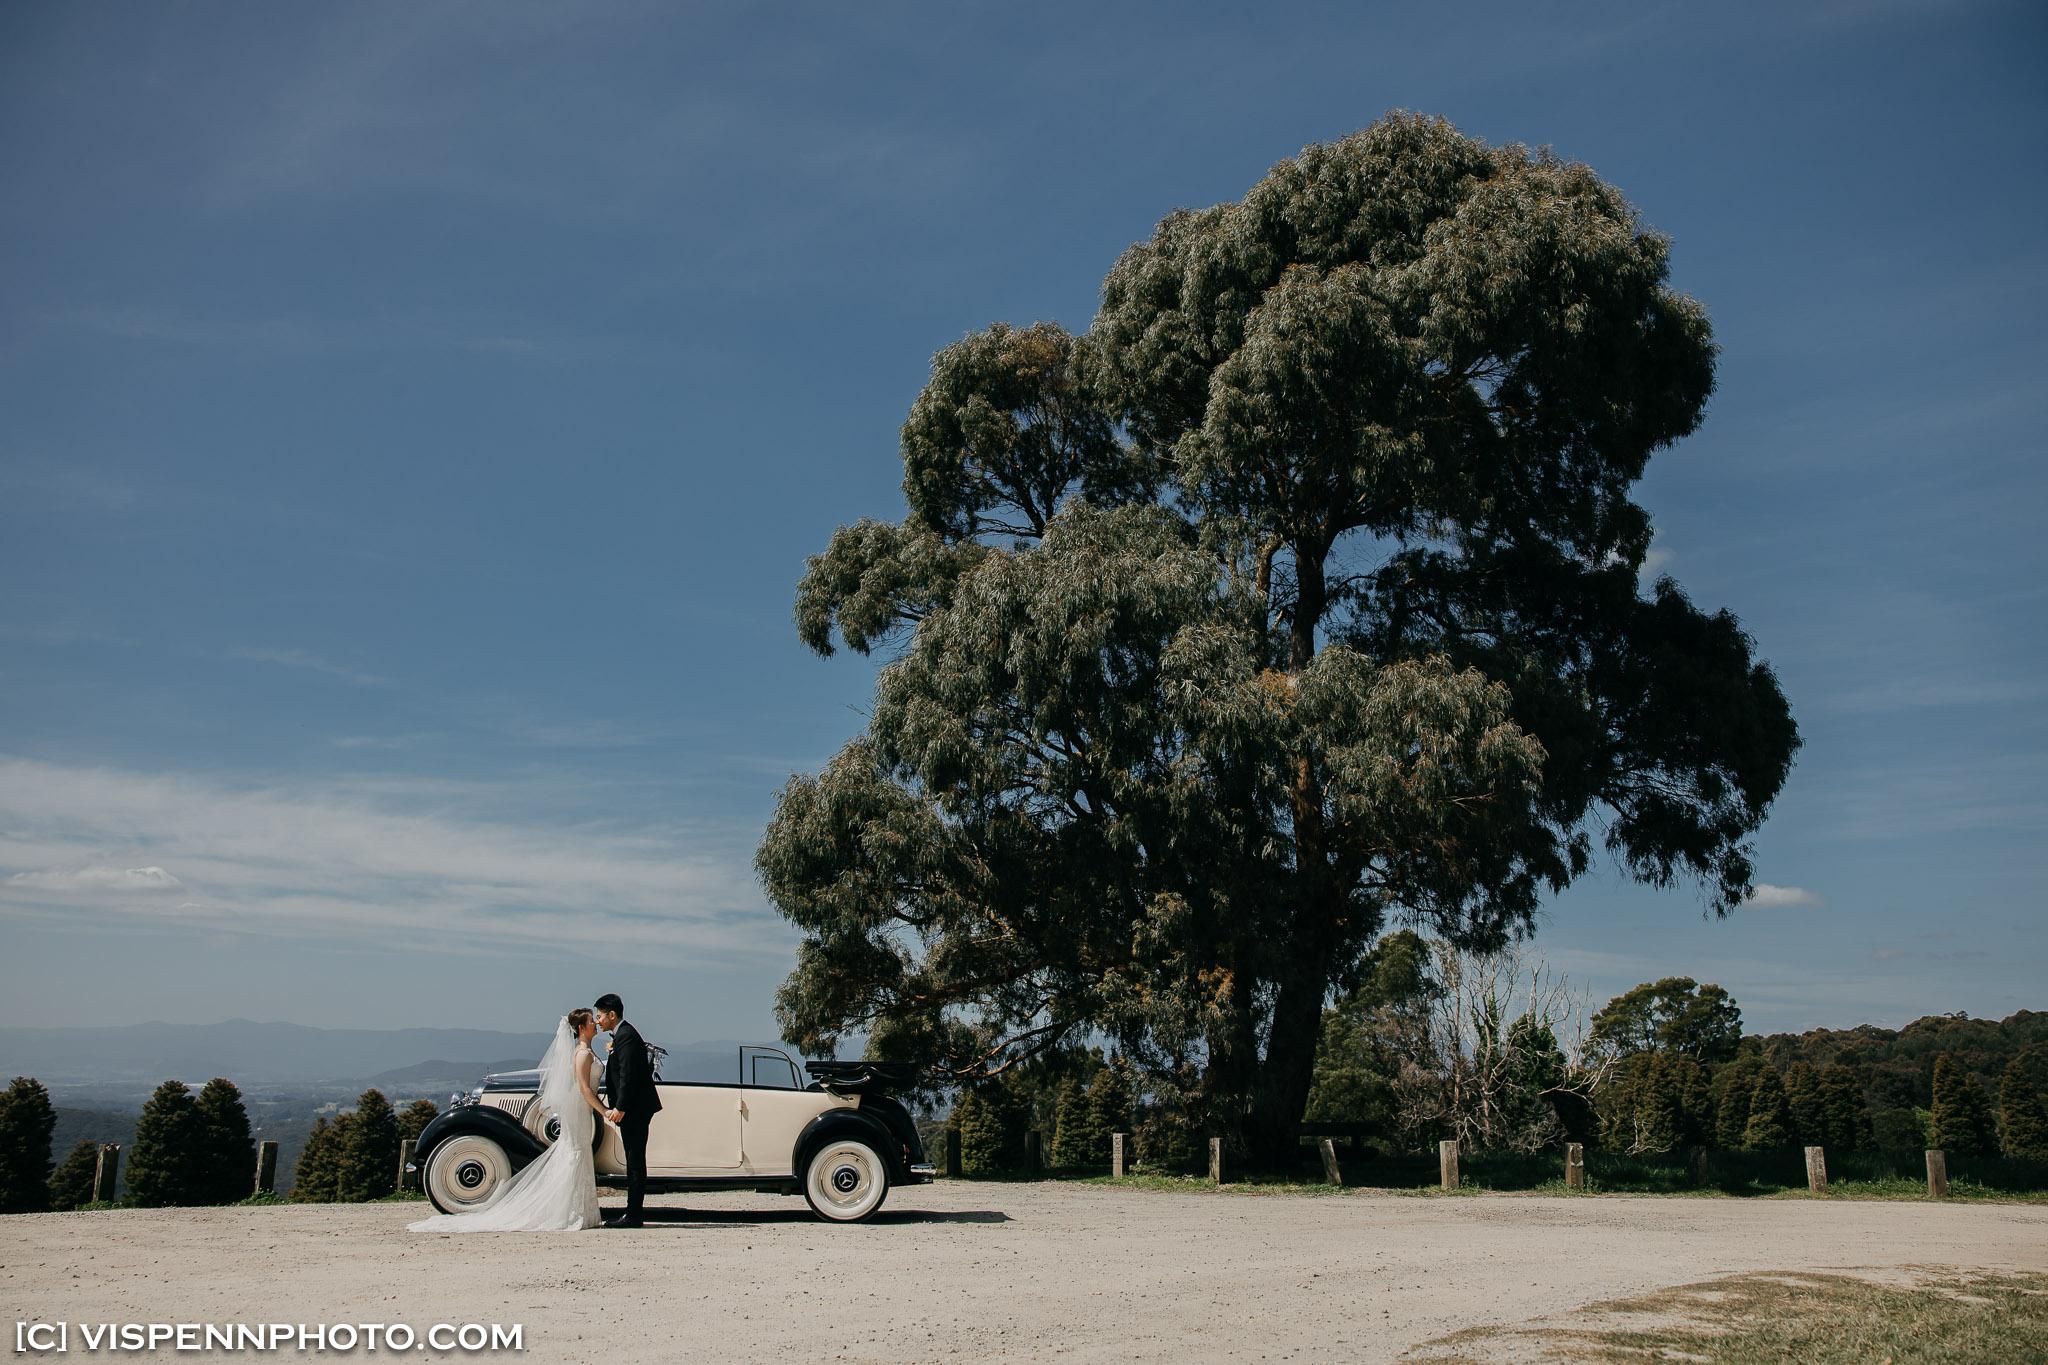 WEDDING DAY Photography Melbourne ElitaPB 06280 1P EOSR ZHPENN